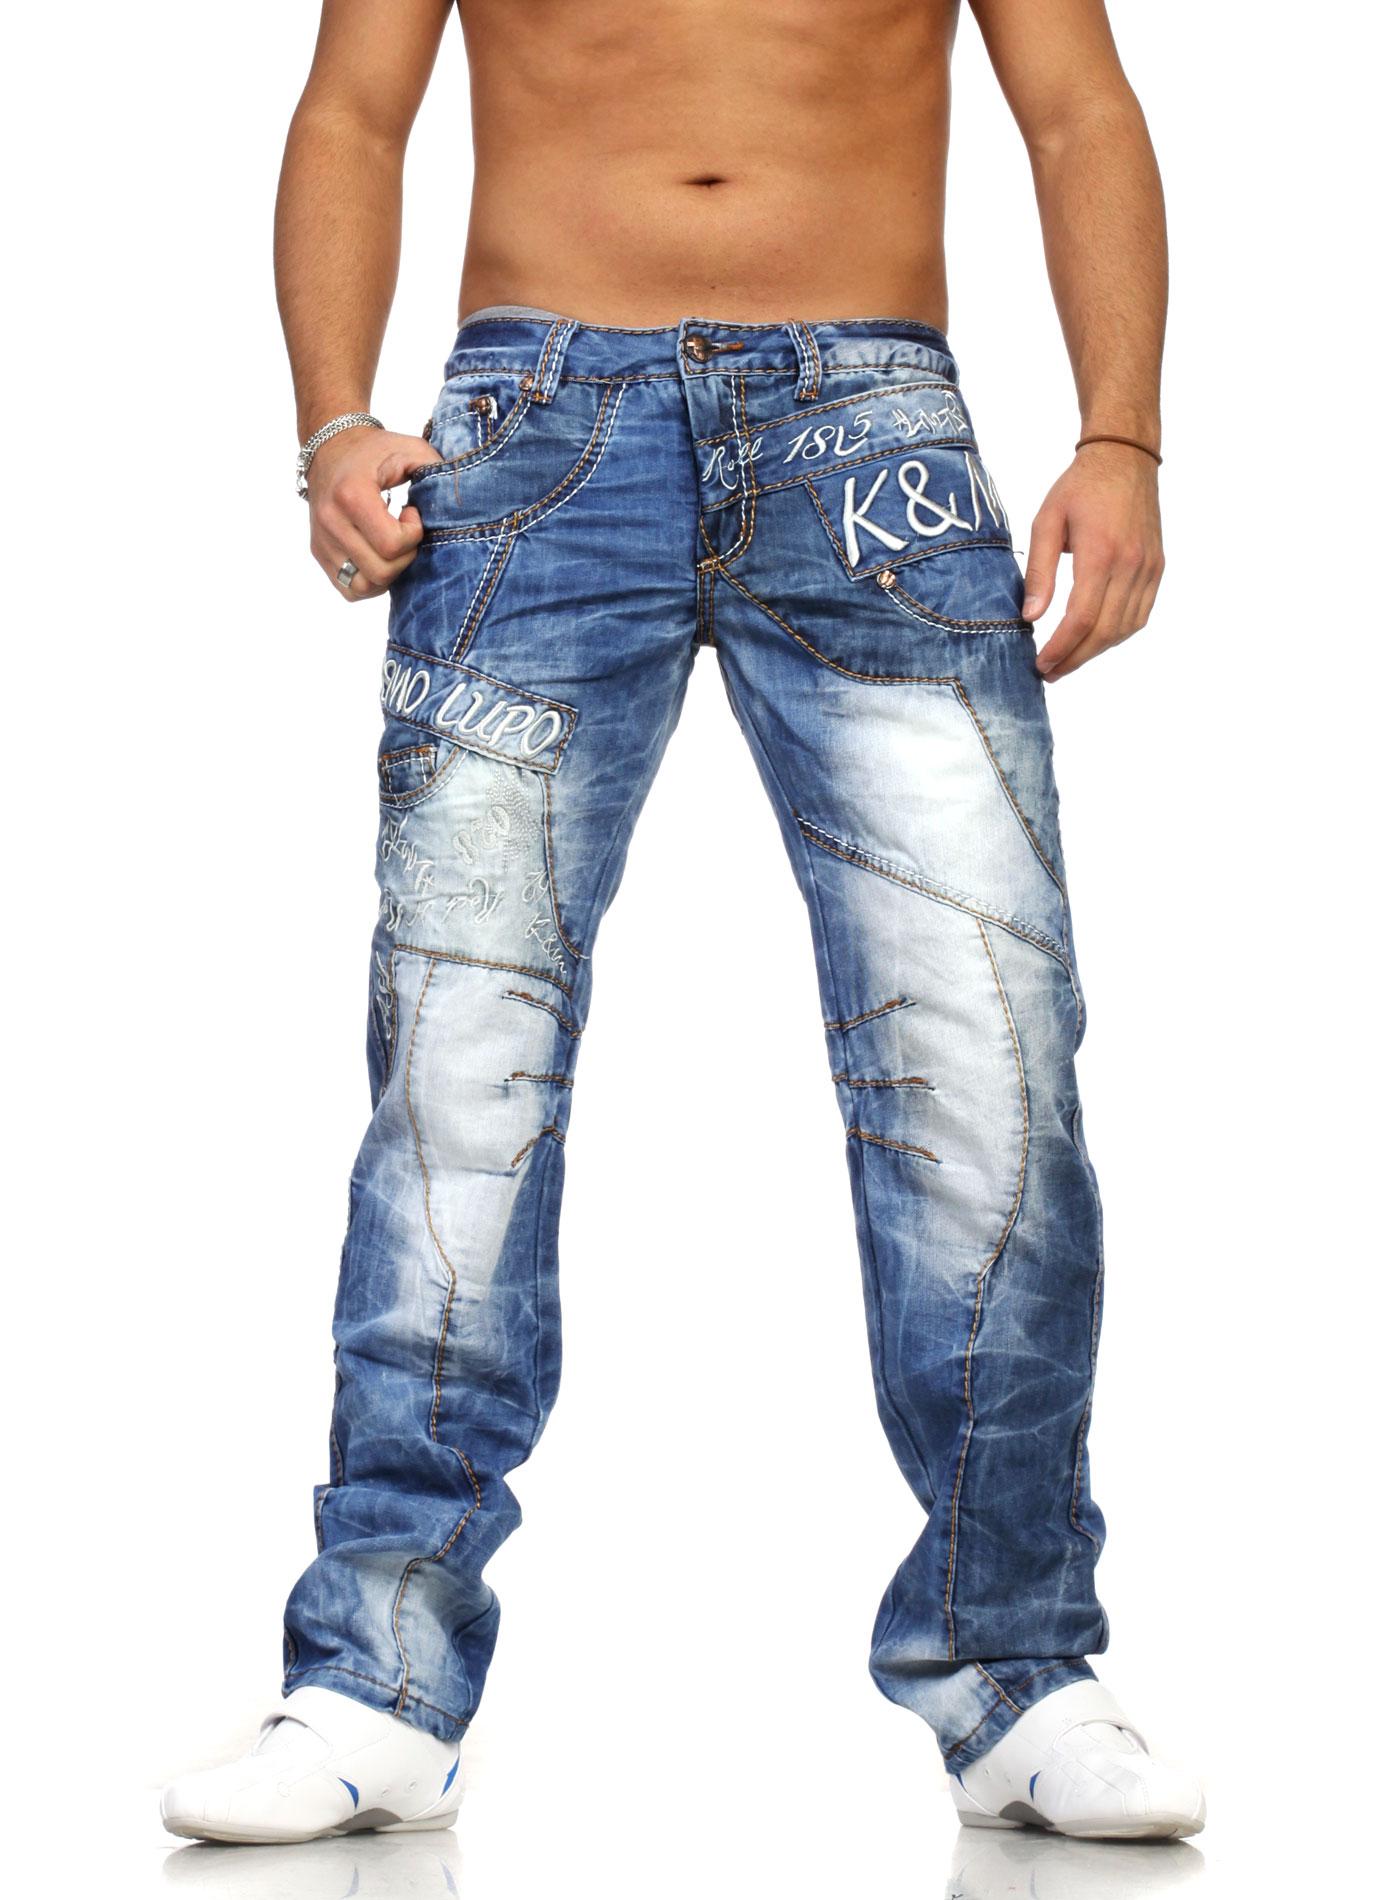 kosmo-lupo-jeans-KM322